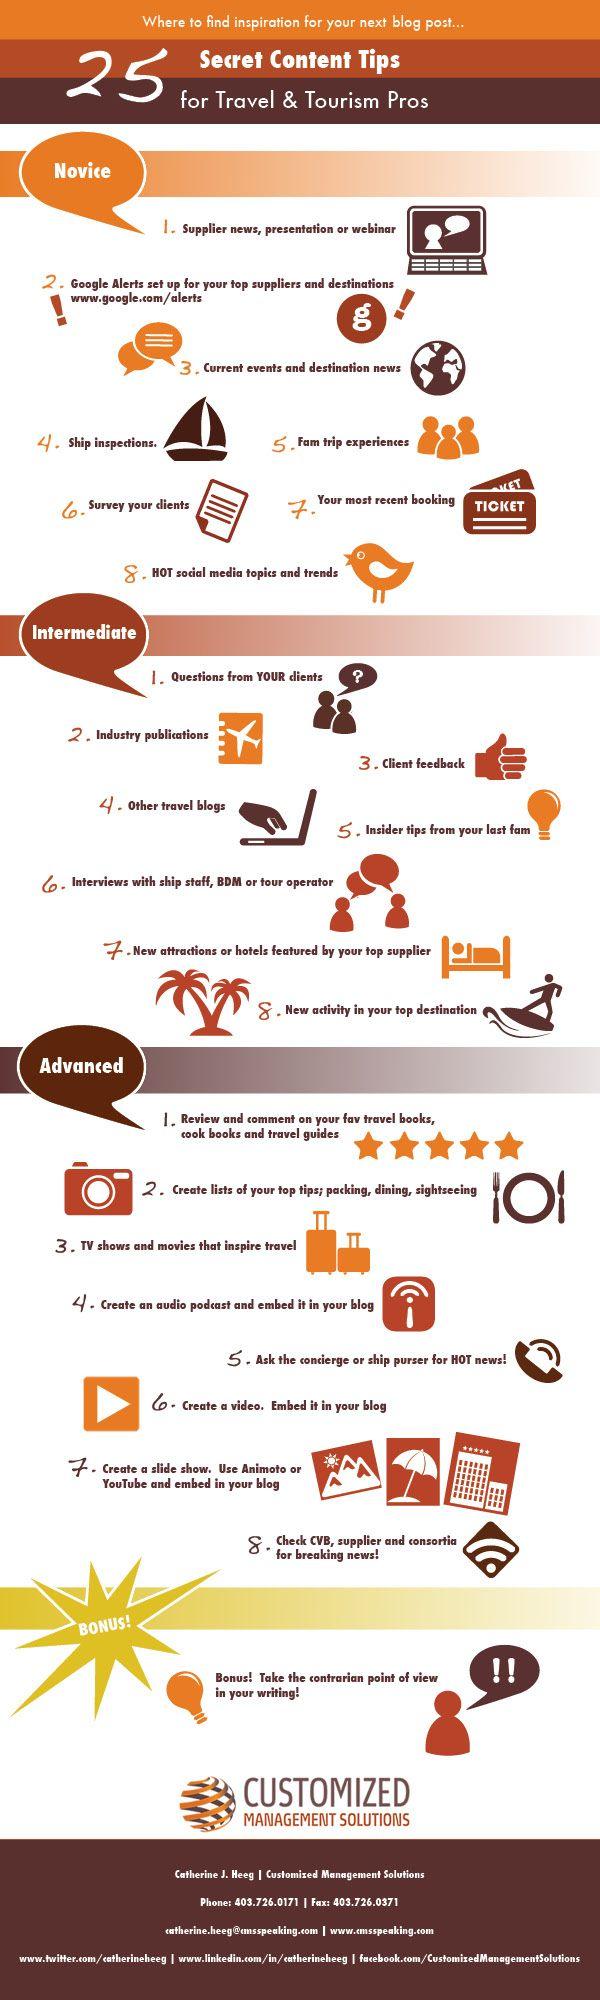 25 Content ideas for your #Blog #socialMedia #Facebook #Twitter